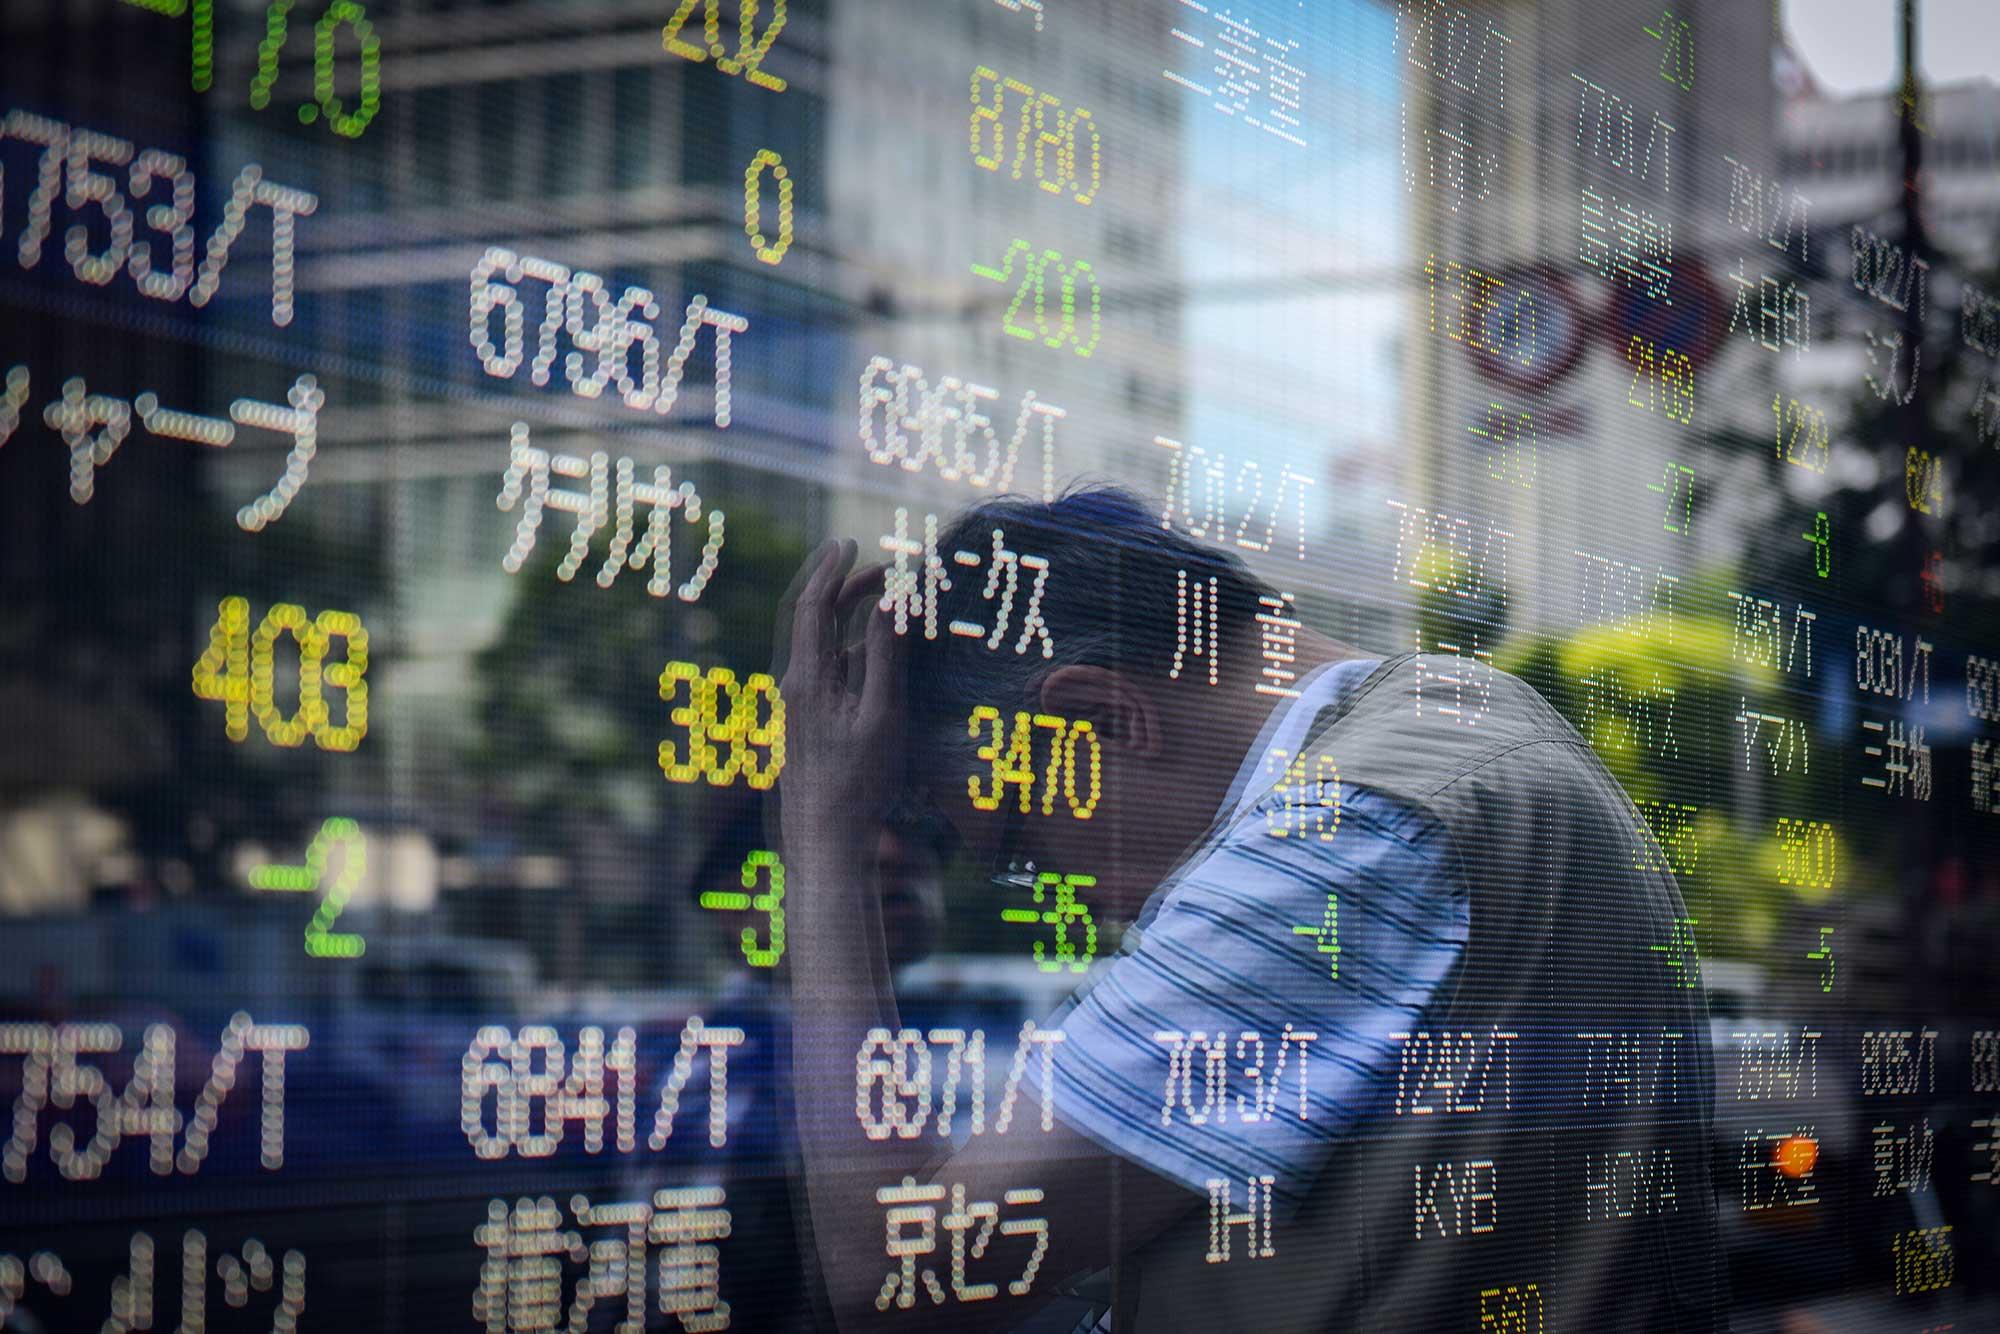 Japan stocks track Wall Street higher, but virus worries weigh